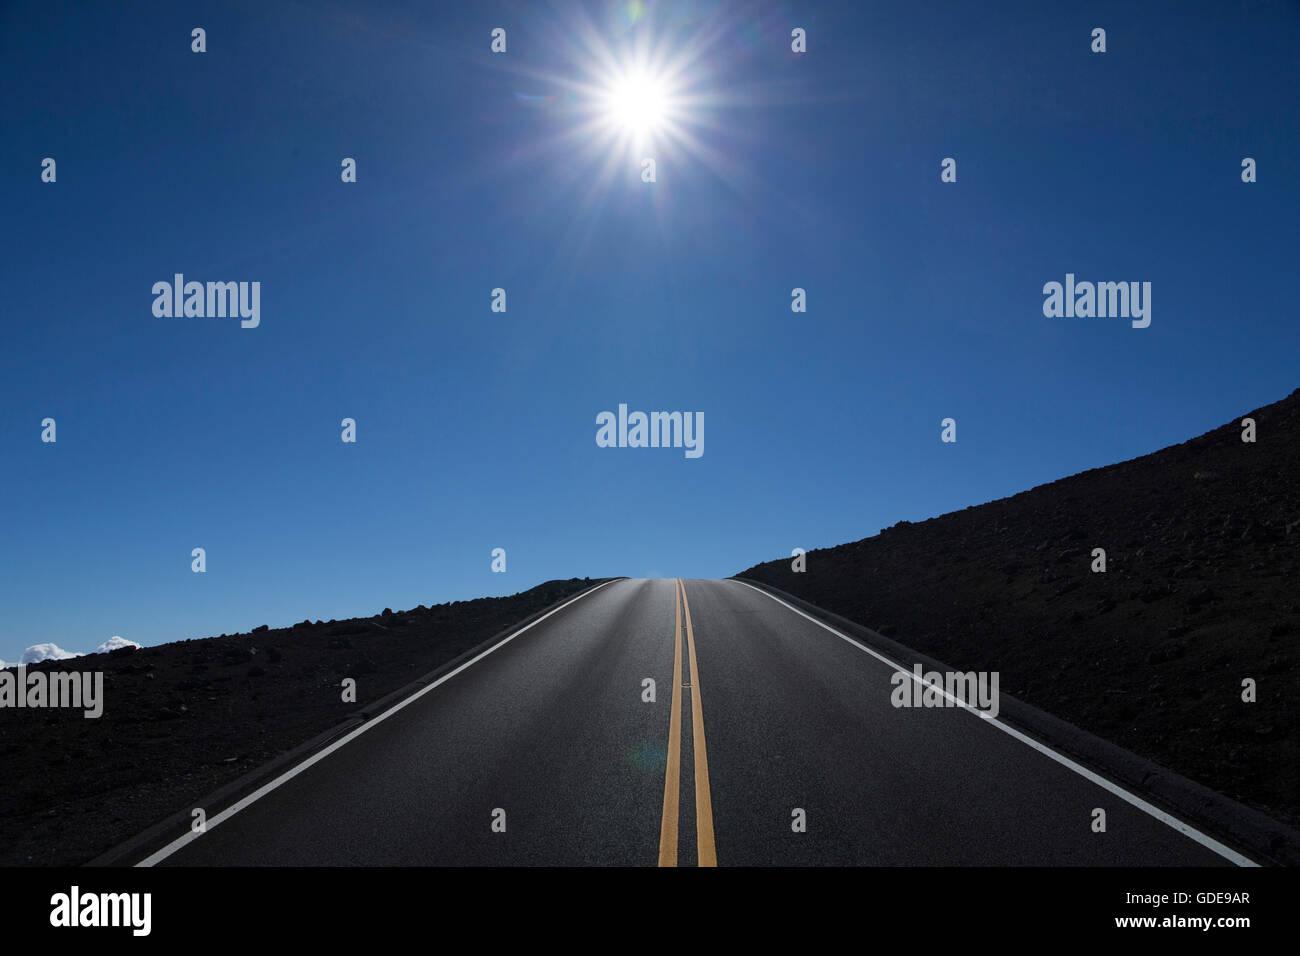 Maui,street,sun,straight,Puu Ulaula,Haleakala,crater,USA,Hawaii,America,Volcanical,lava, - Stock Image